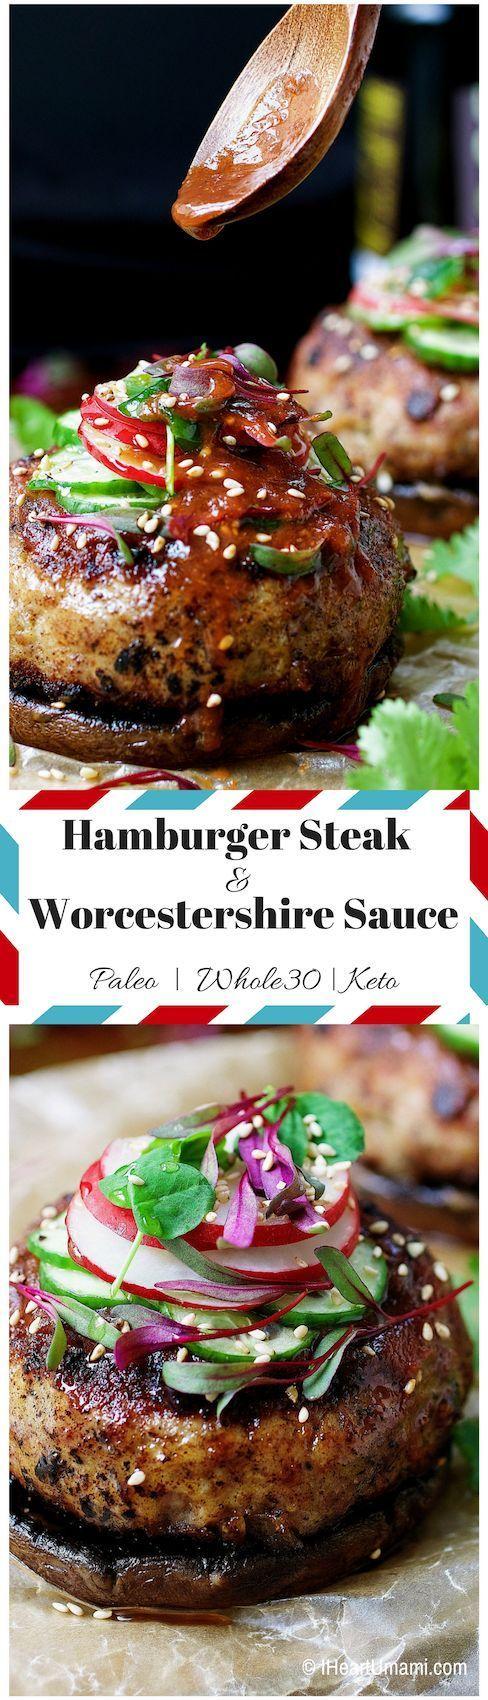 Paleo Worcestershire Sauce Hamburger Steak. Paleo/Whole30/Keto Worcestershire sauce with Japanese-style Hamburger steak. Easy, tasty, juicy hamburger with no added sugar Worcestershire sauce. IHeartUmami.com